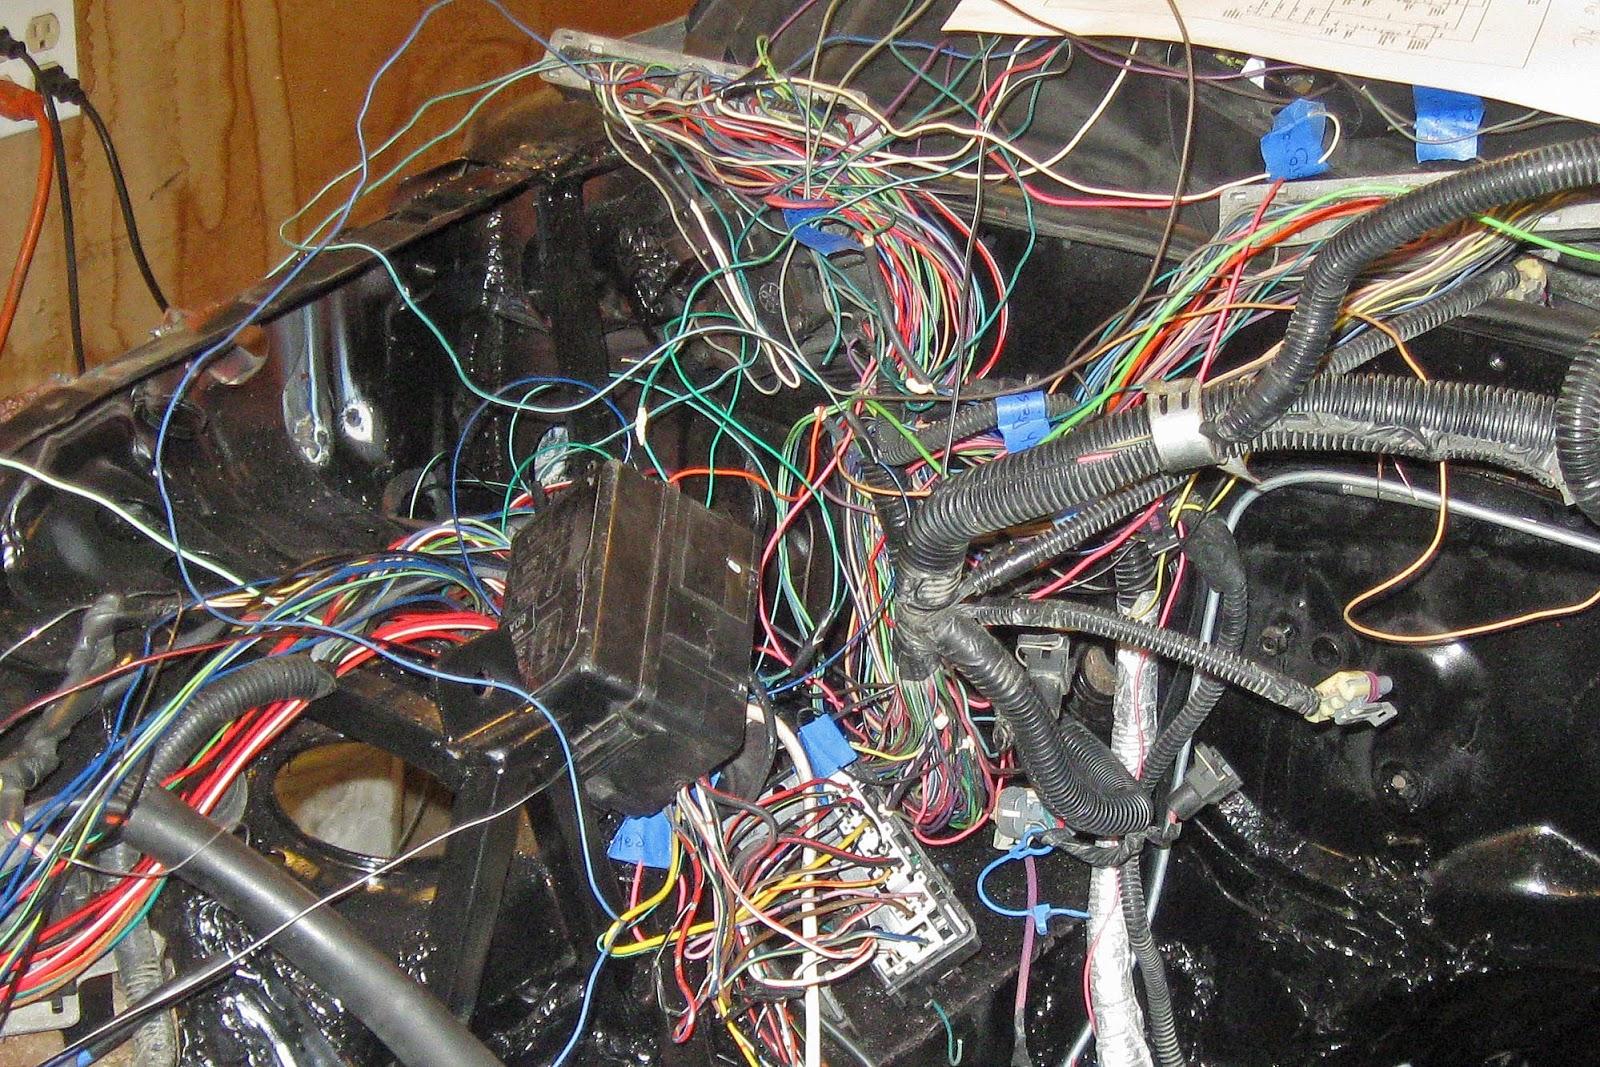 post+5+2+7 jim and jenna build diary, miata ls1 conversion v8 miata wiring ls1 miata wiring harness at creativeand.co